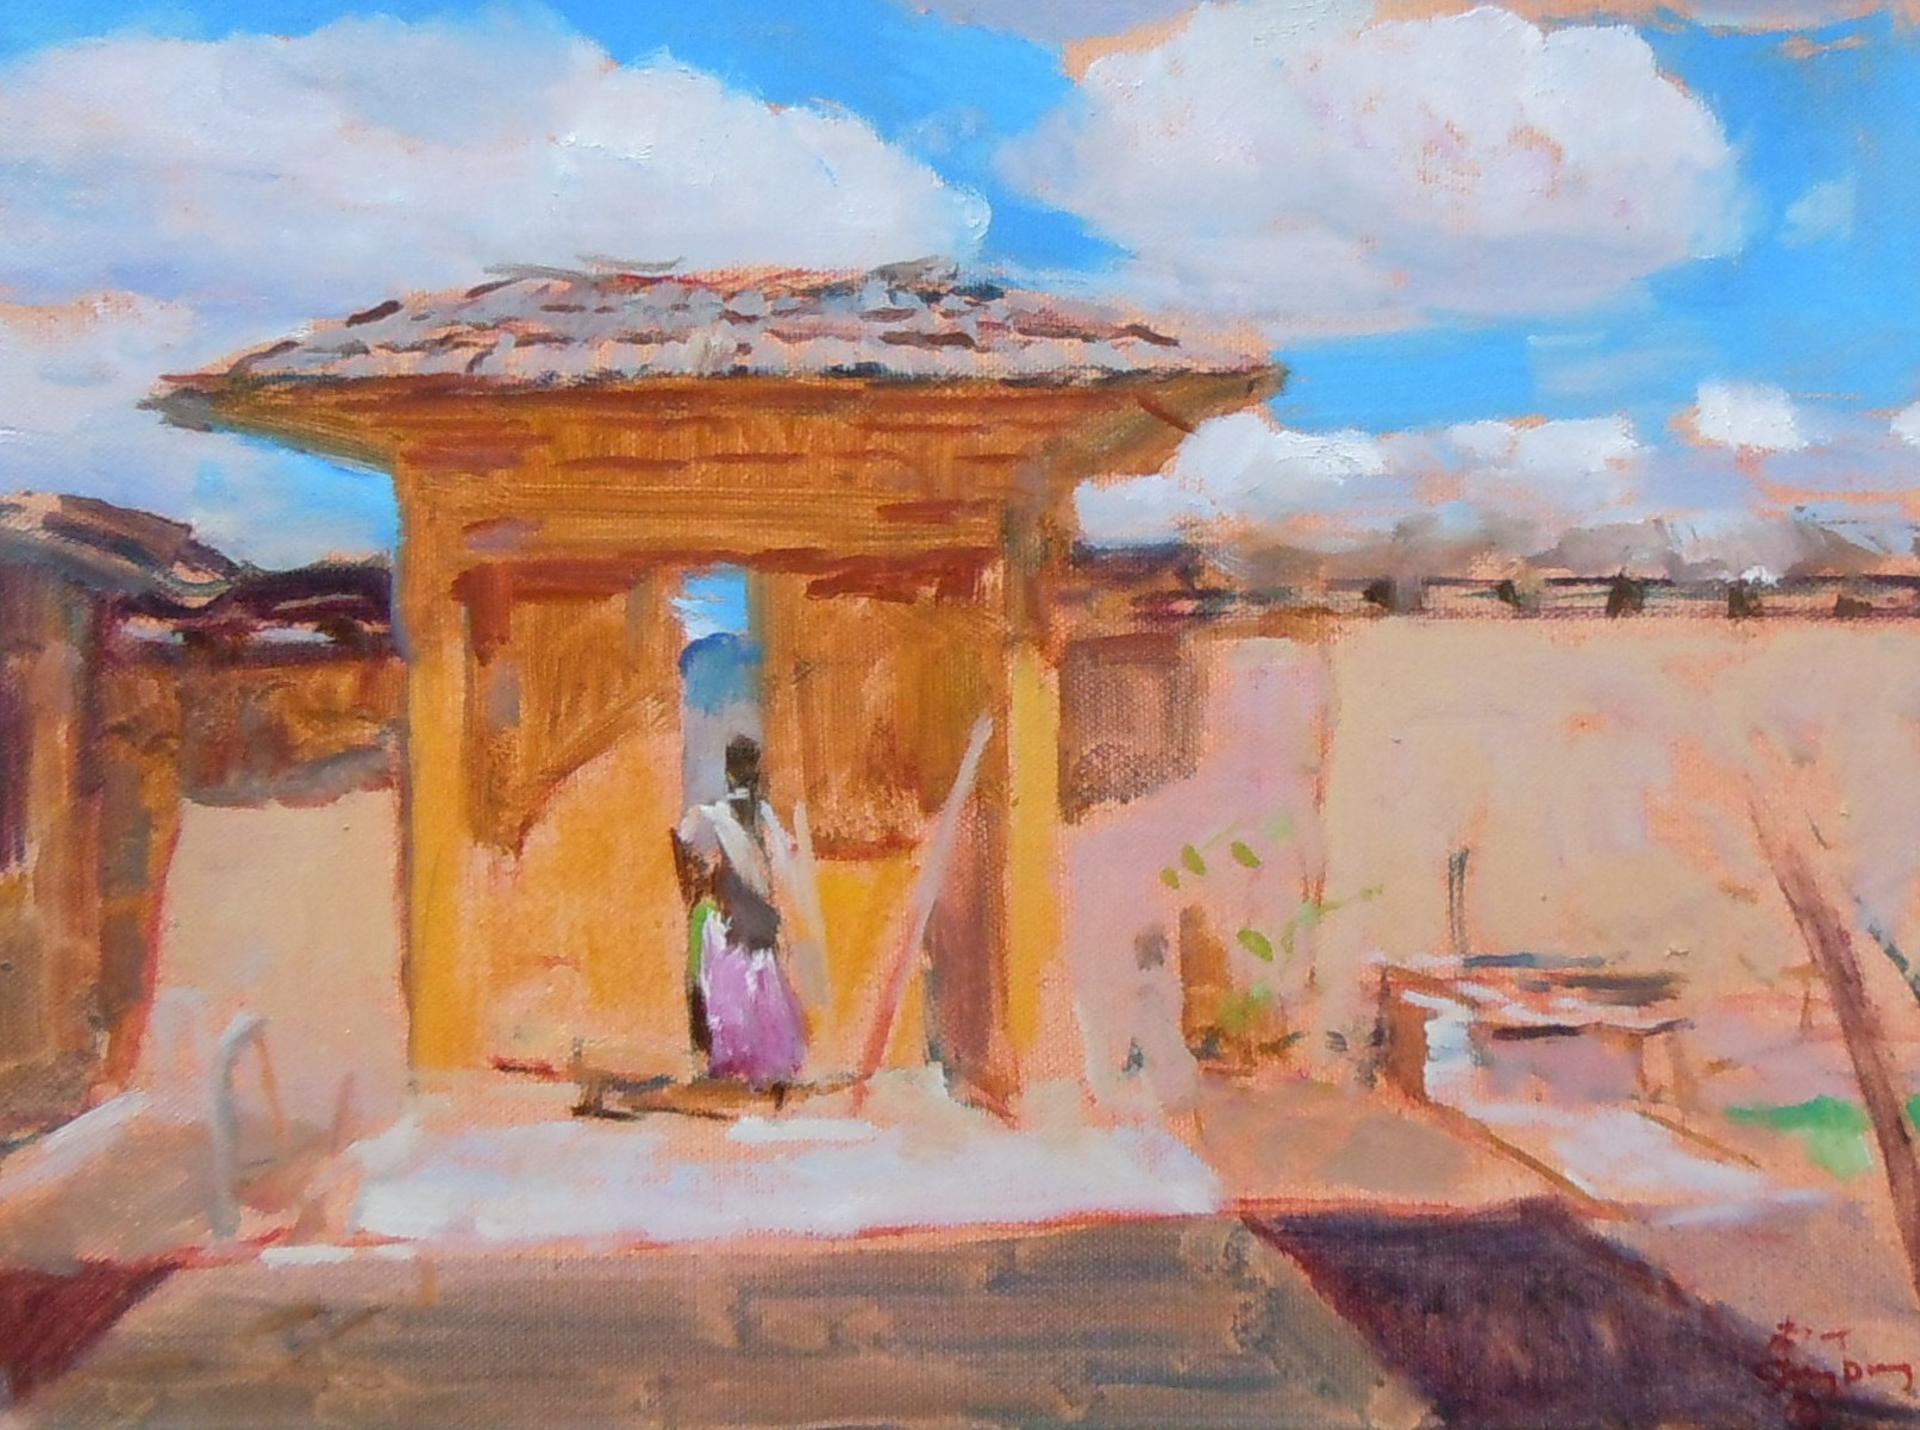 Shangri-La Study 2 by Shang Ding